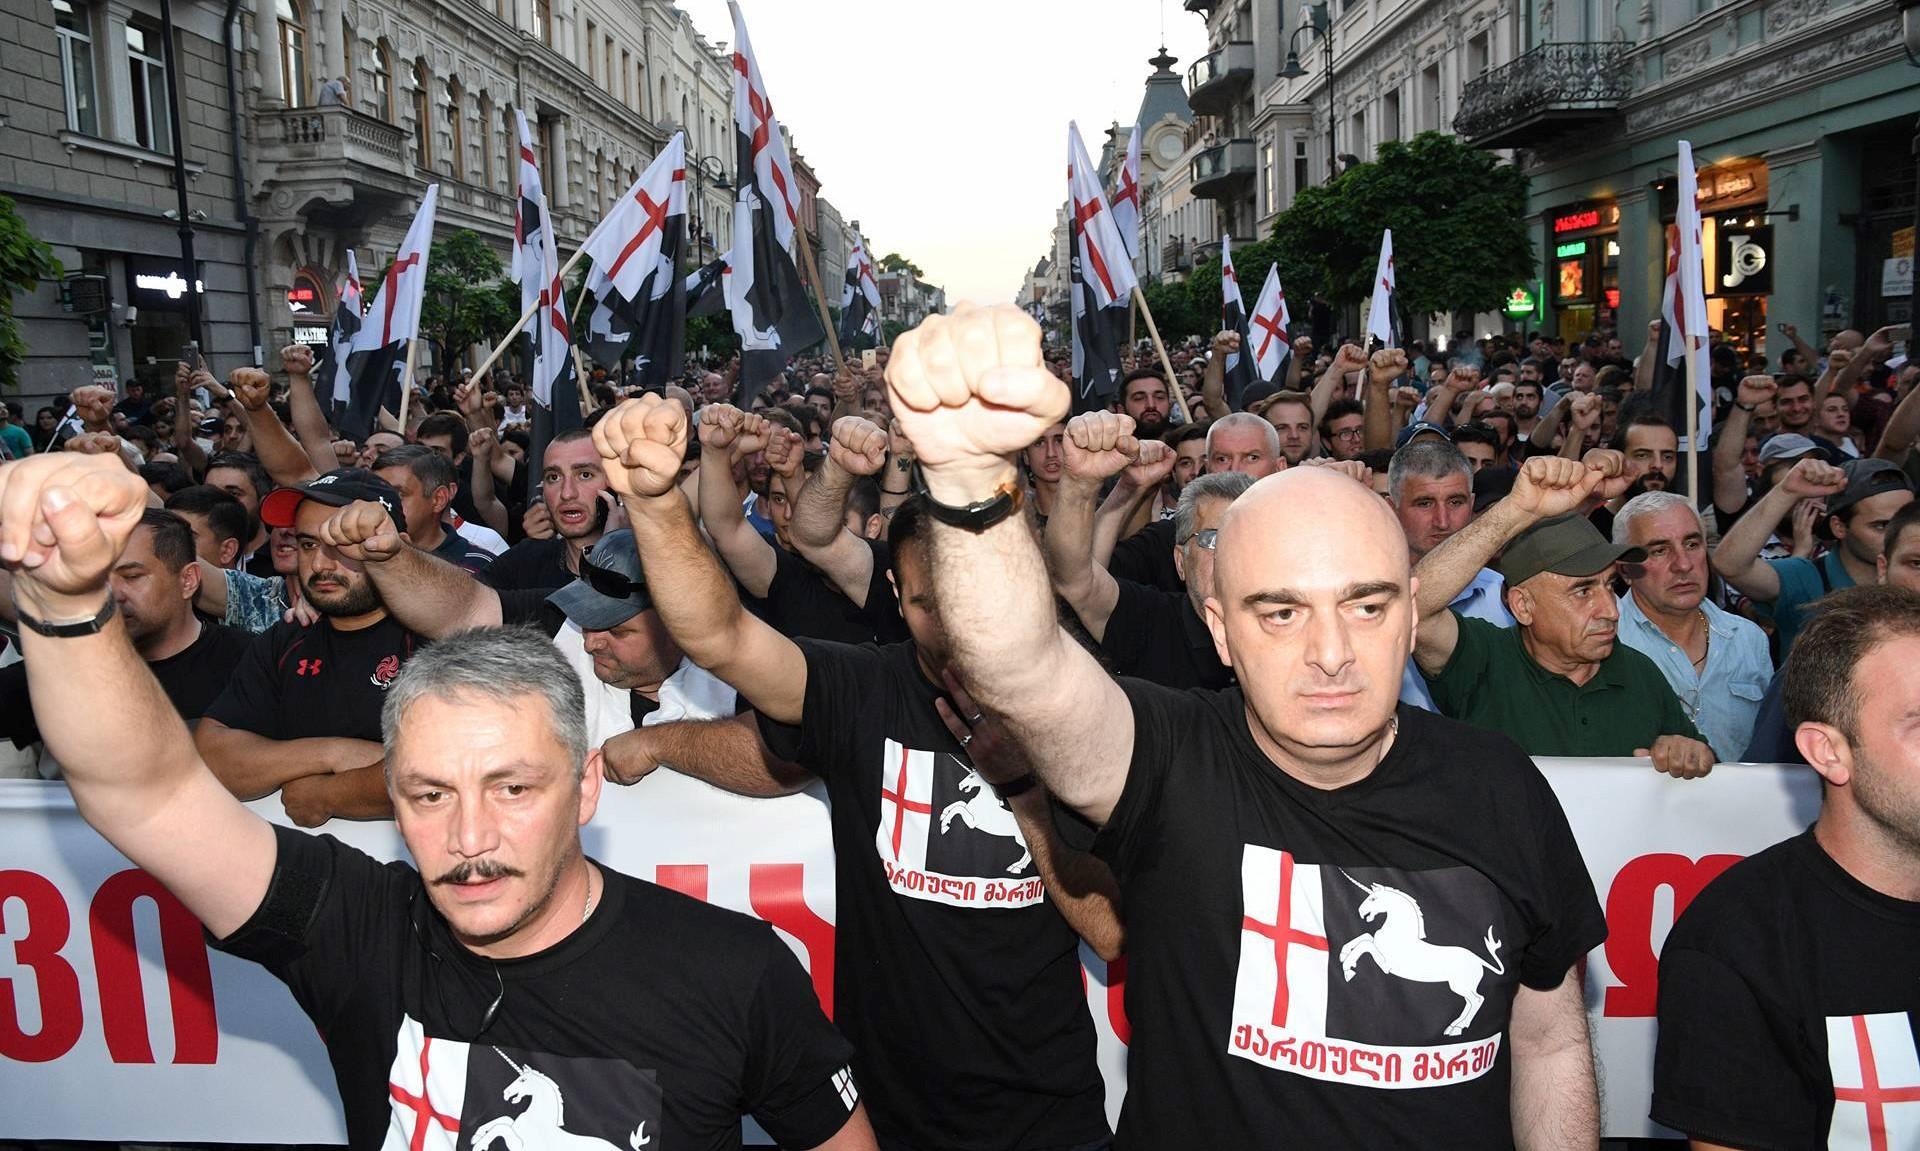 The Georgian march голодовка голодовка